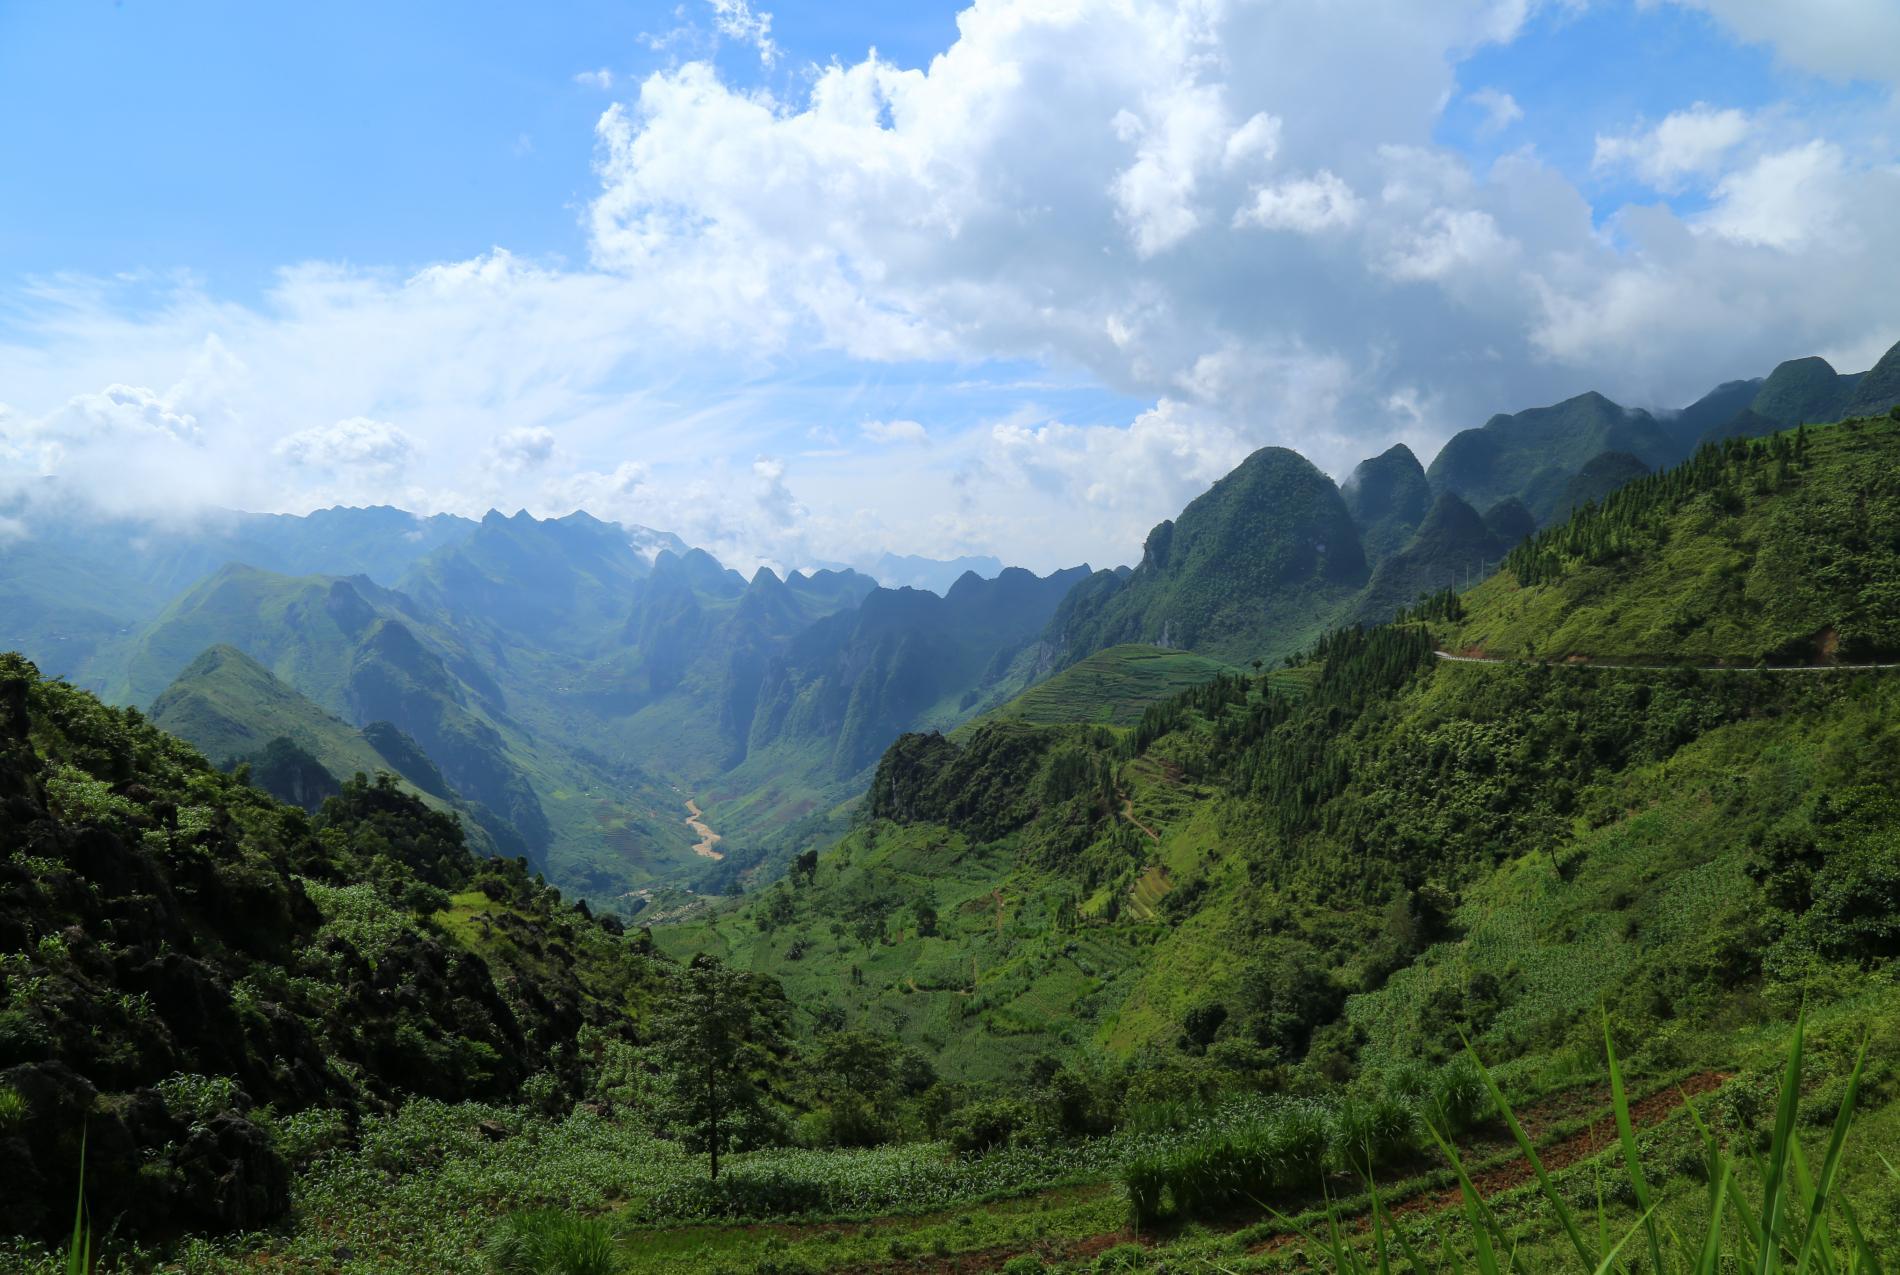 Voyage solidaire Vietnam : Vision du Monde - Photo 7